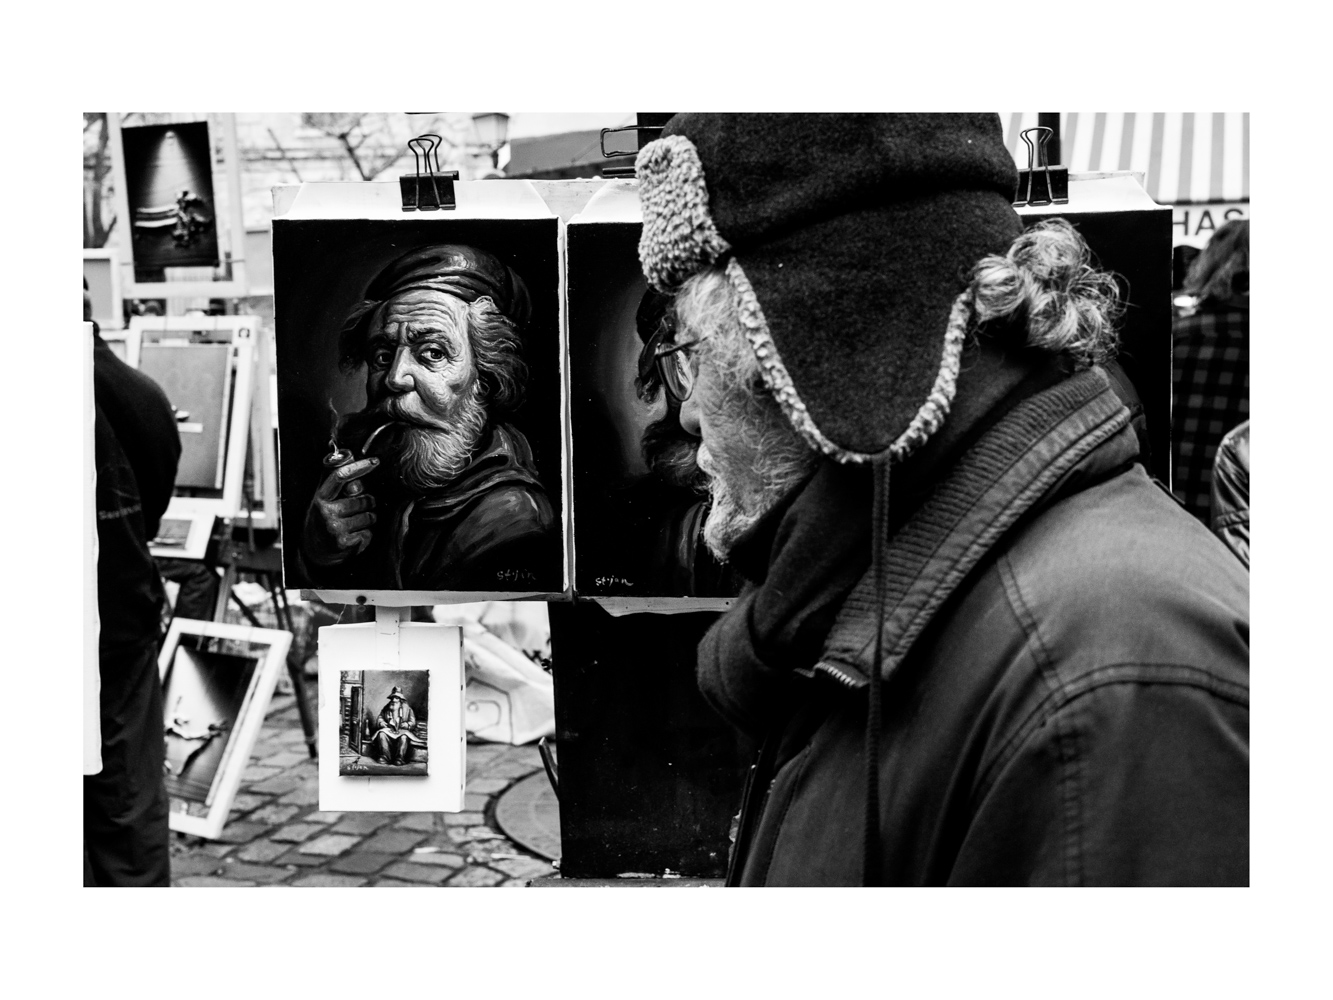 Paul Hands Portfolio Commercial Documentary Photographer Hinckley Leicestershire Warwickshire Midlands England UK